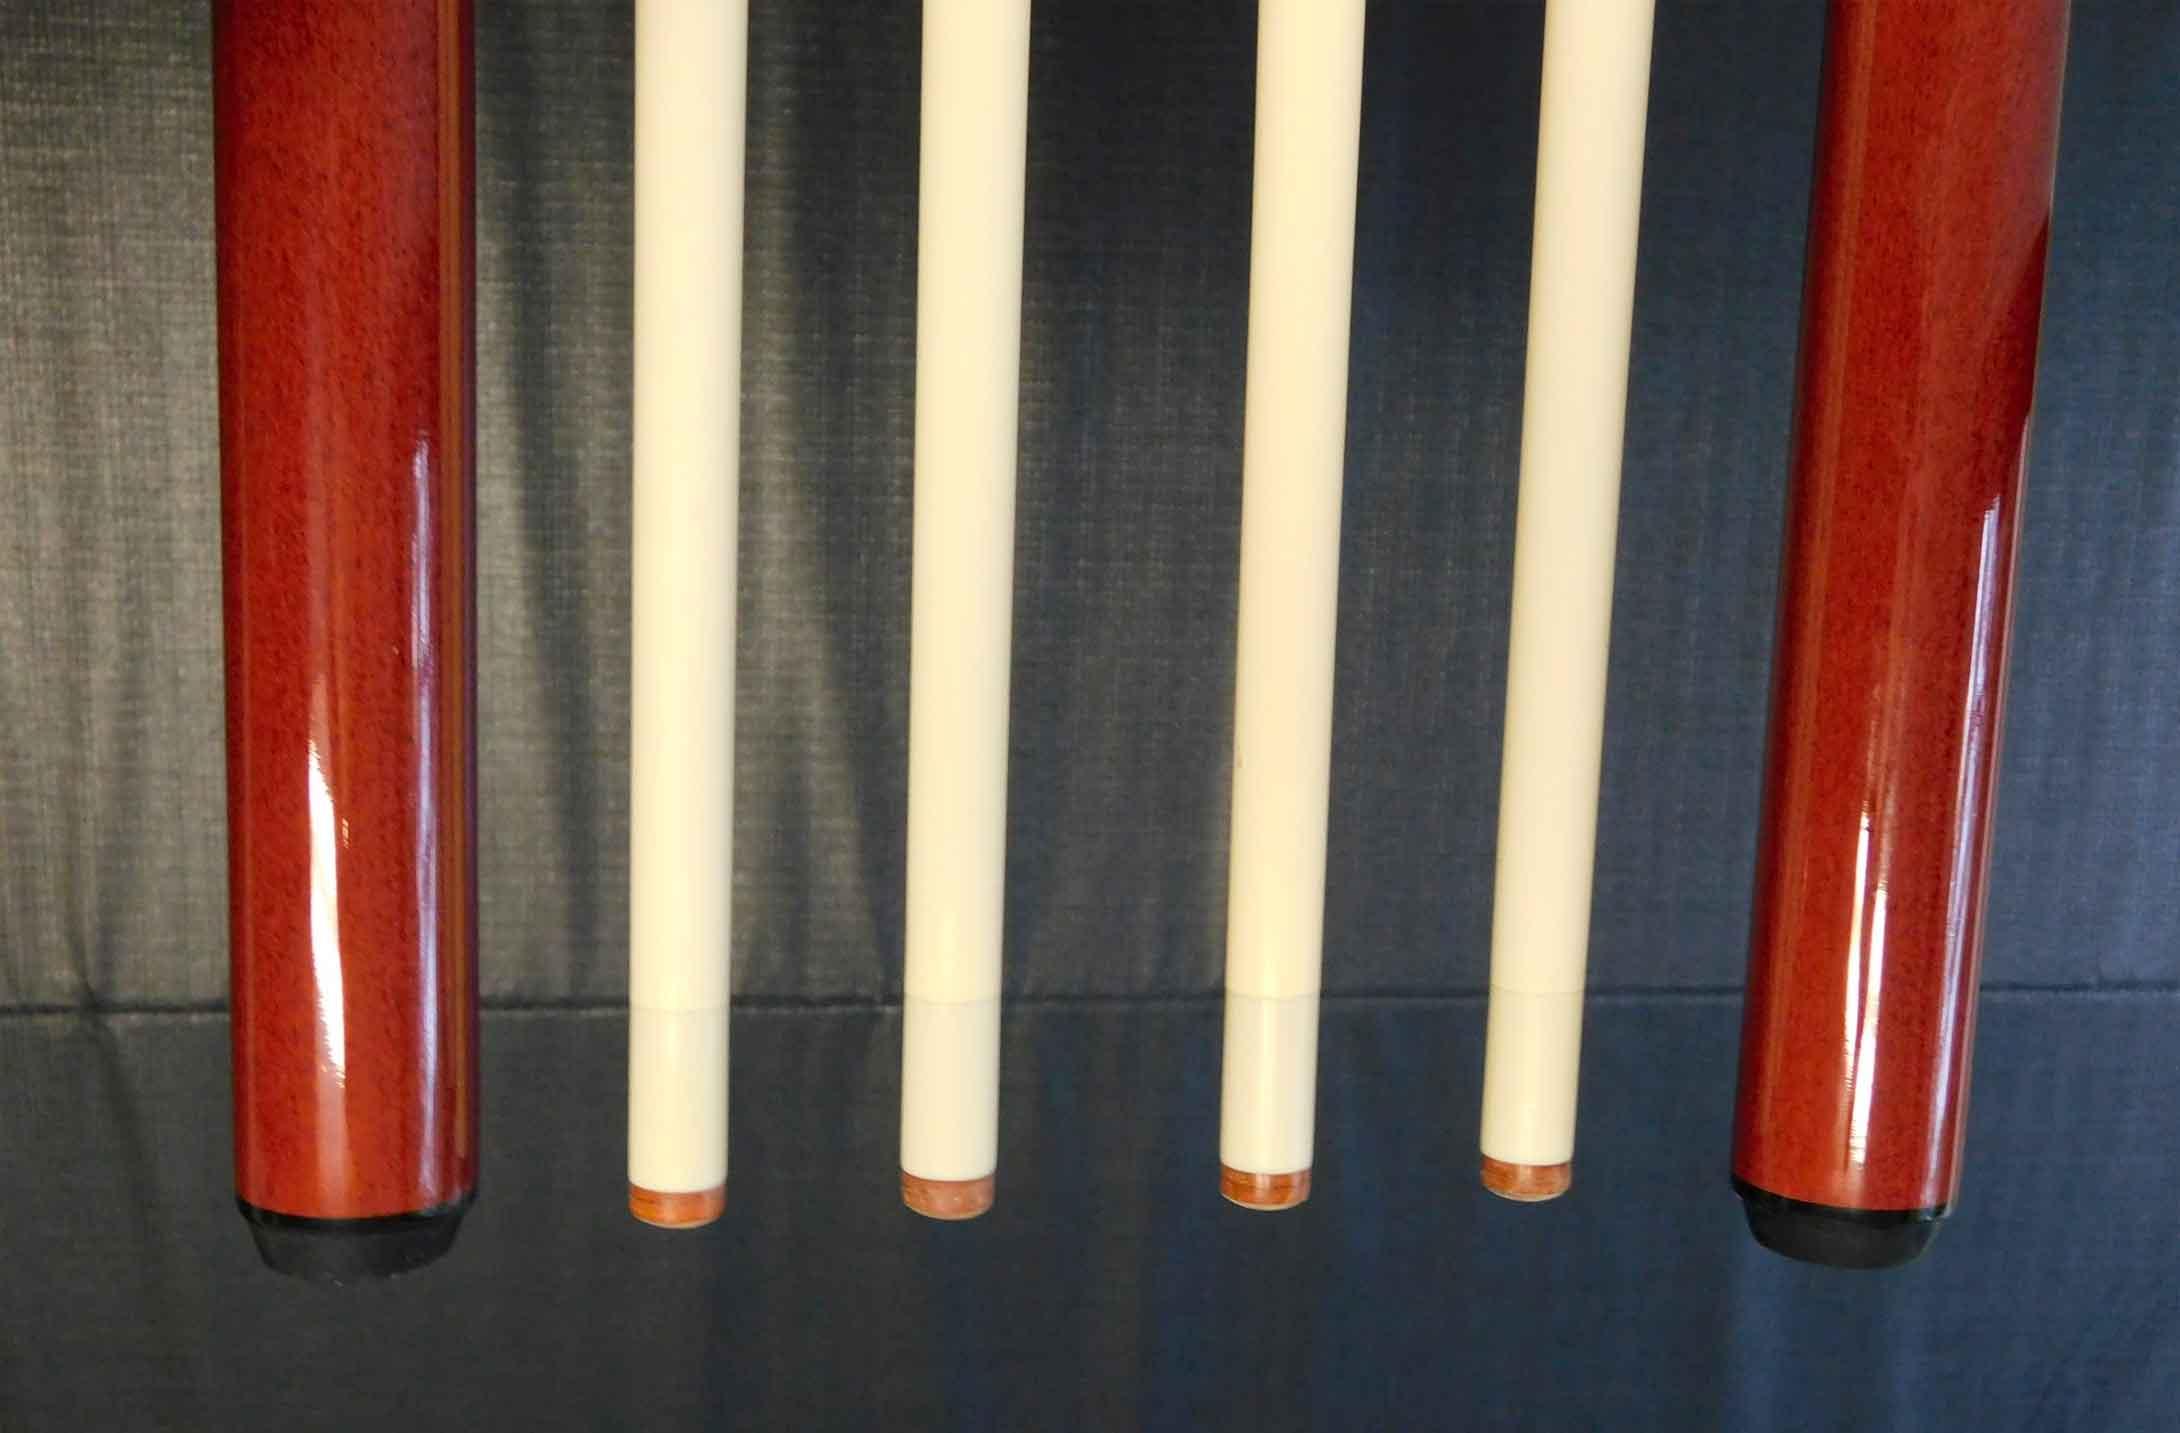 Buy Pool Sticks